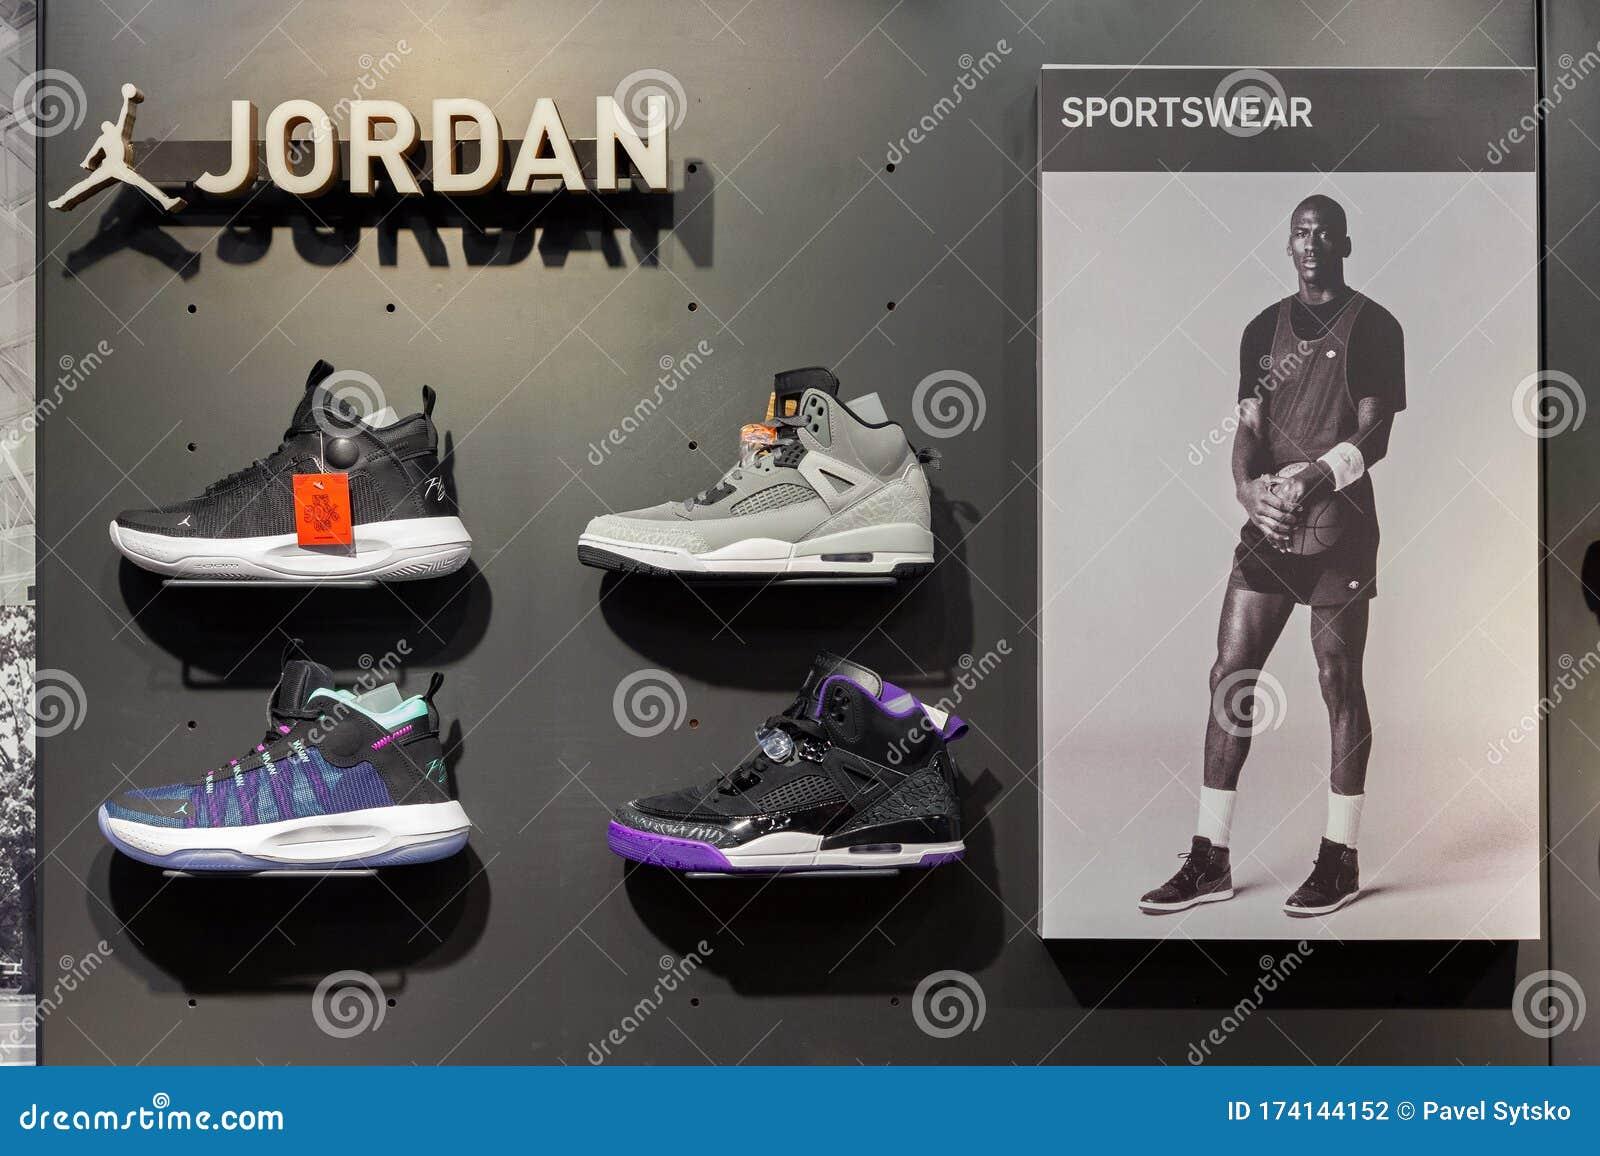 Nike Jordan Series Basketball Shoes